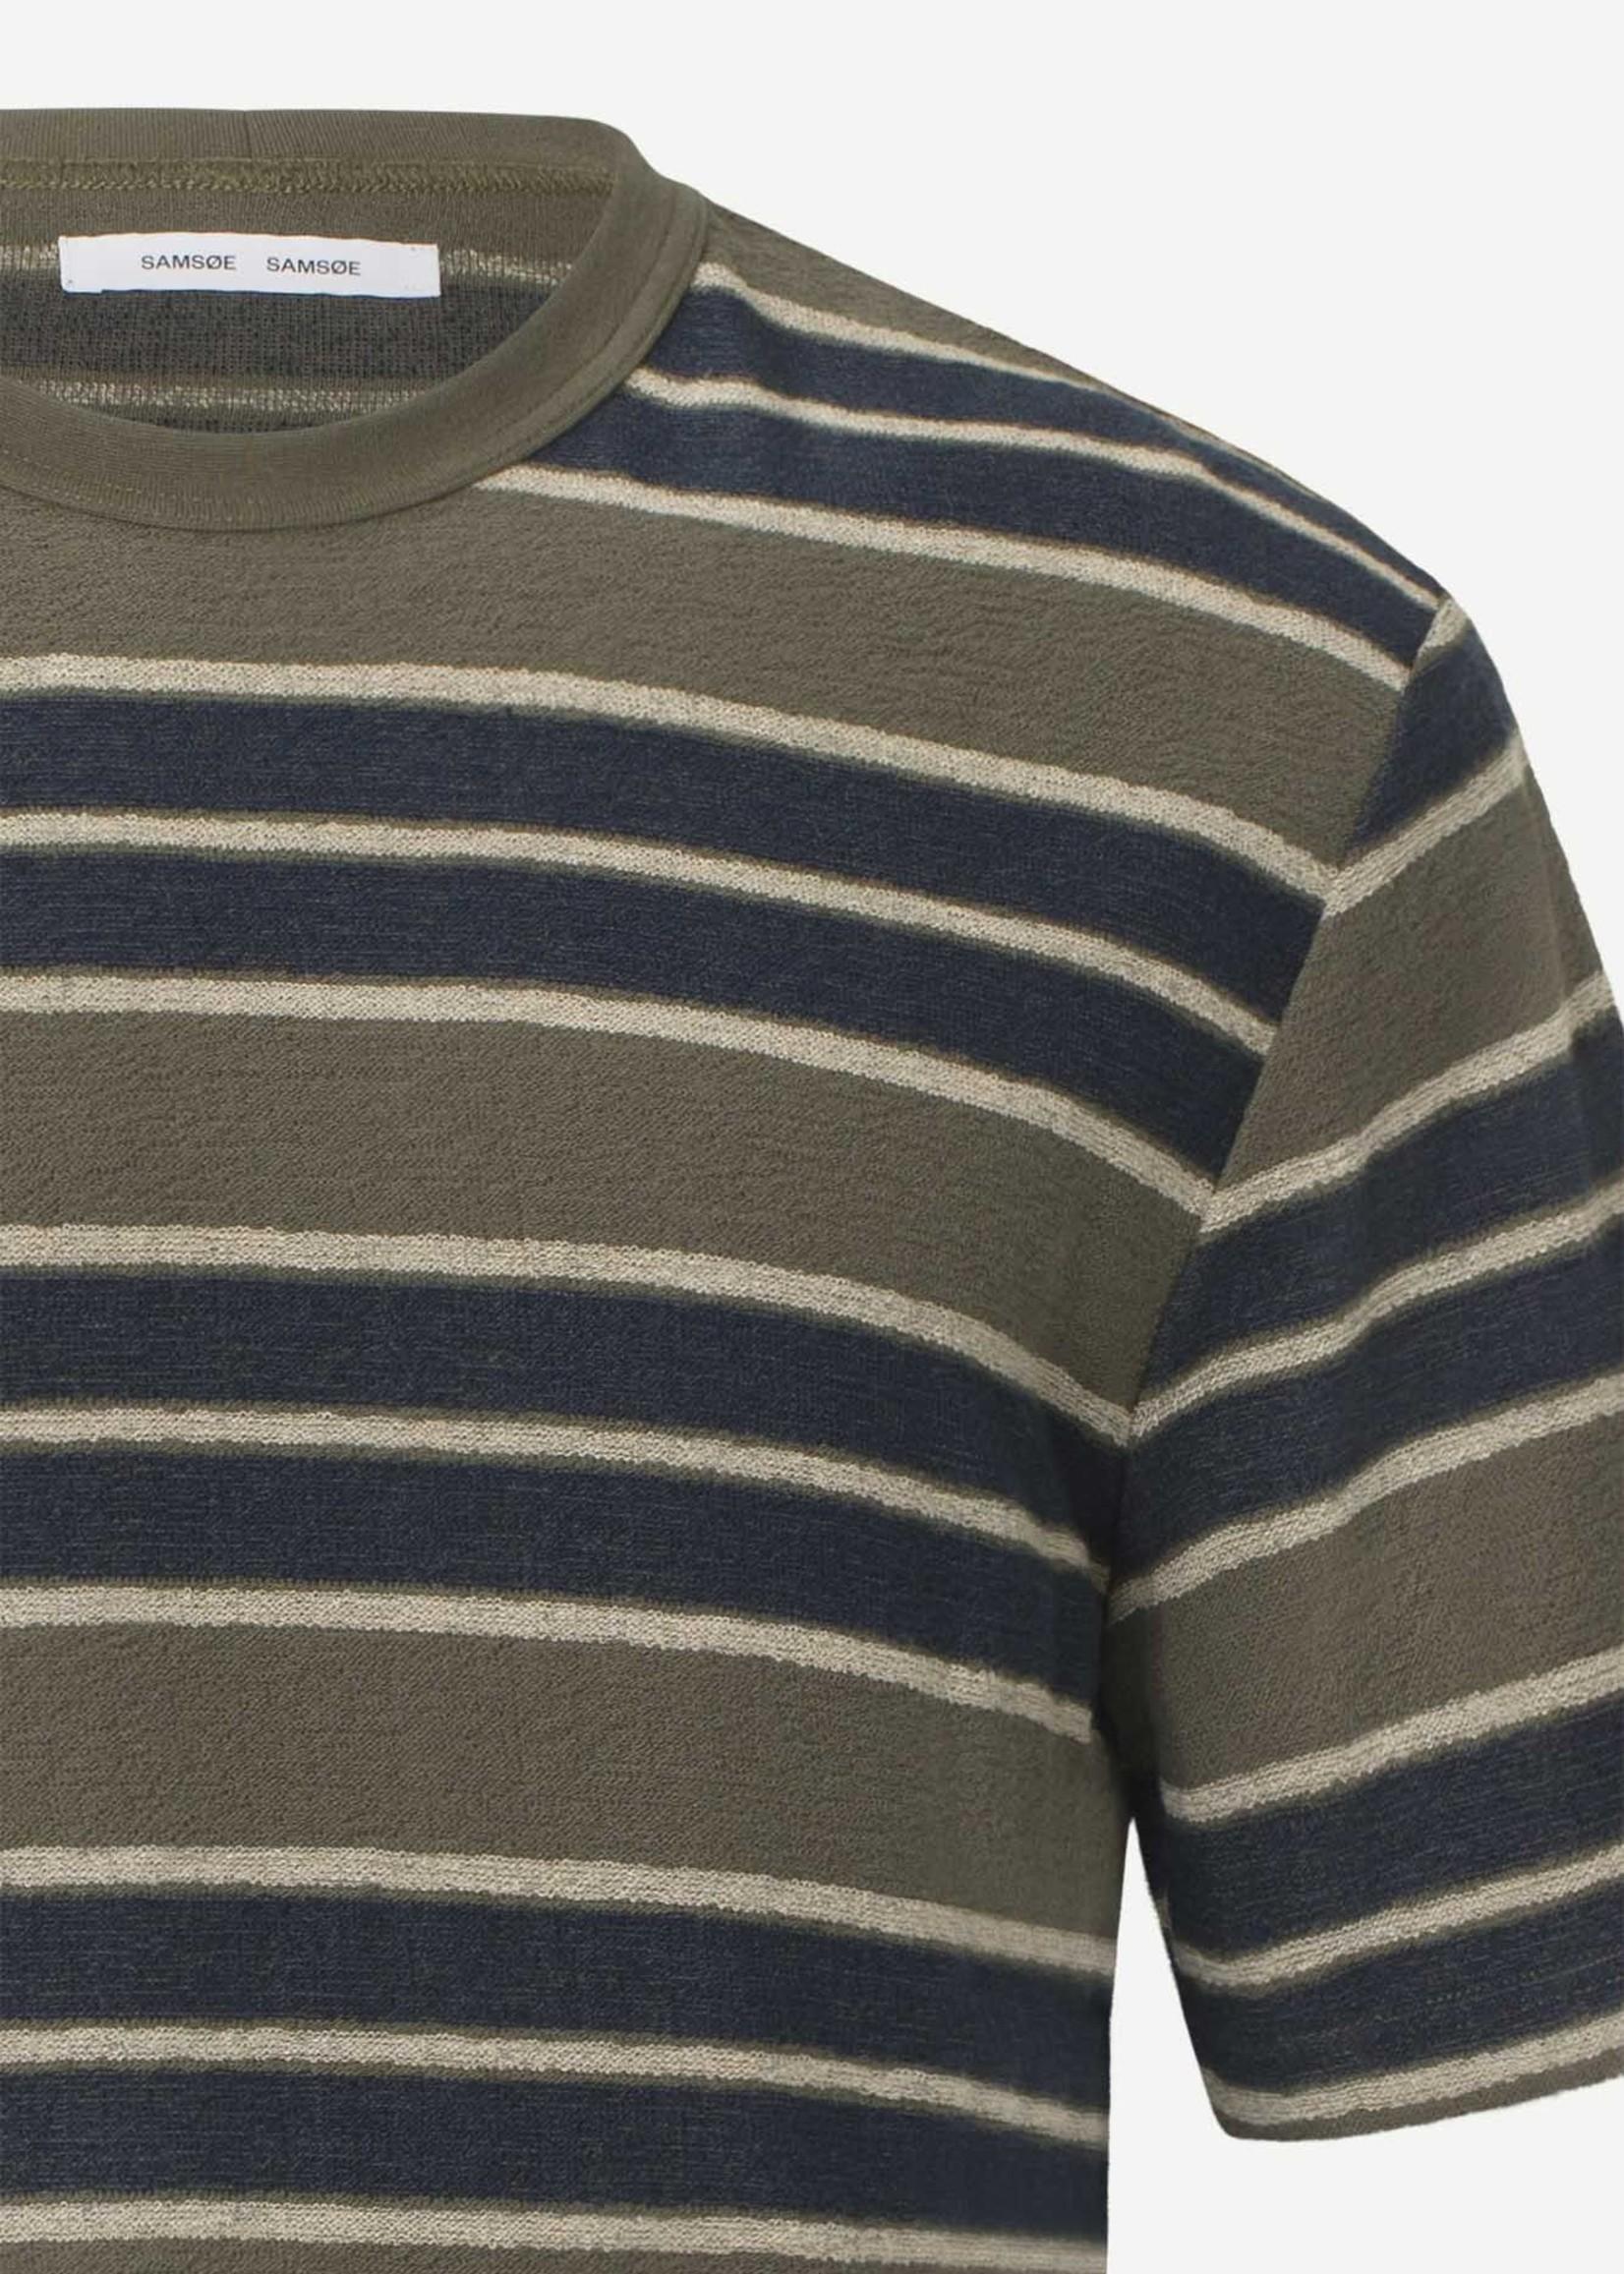 Samsoe & Samsoe Katlego T-Shirt St. 11600